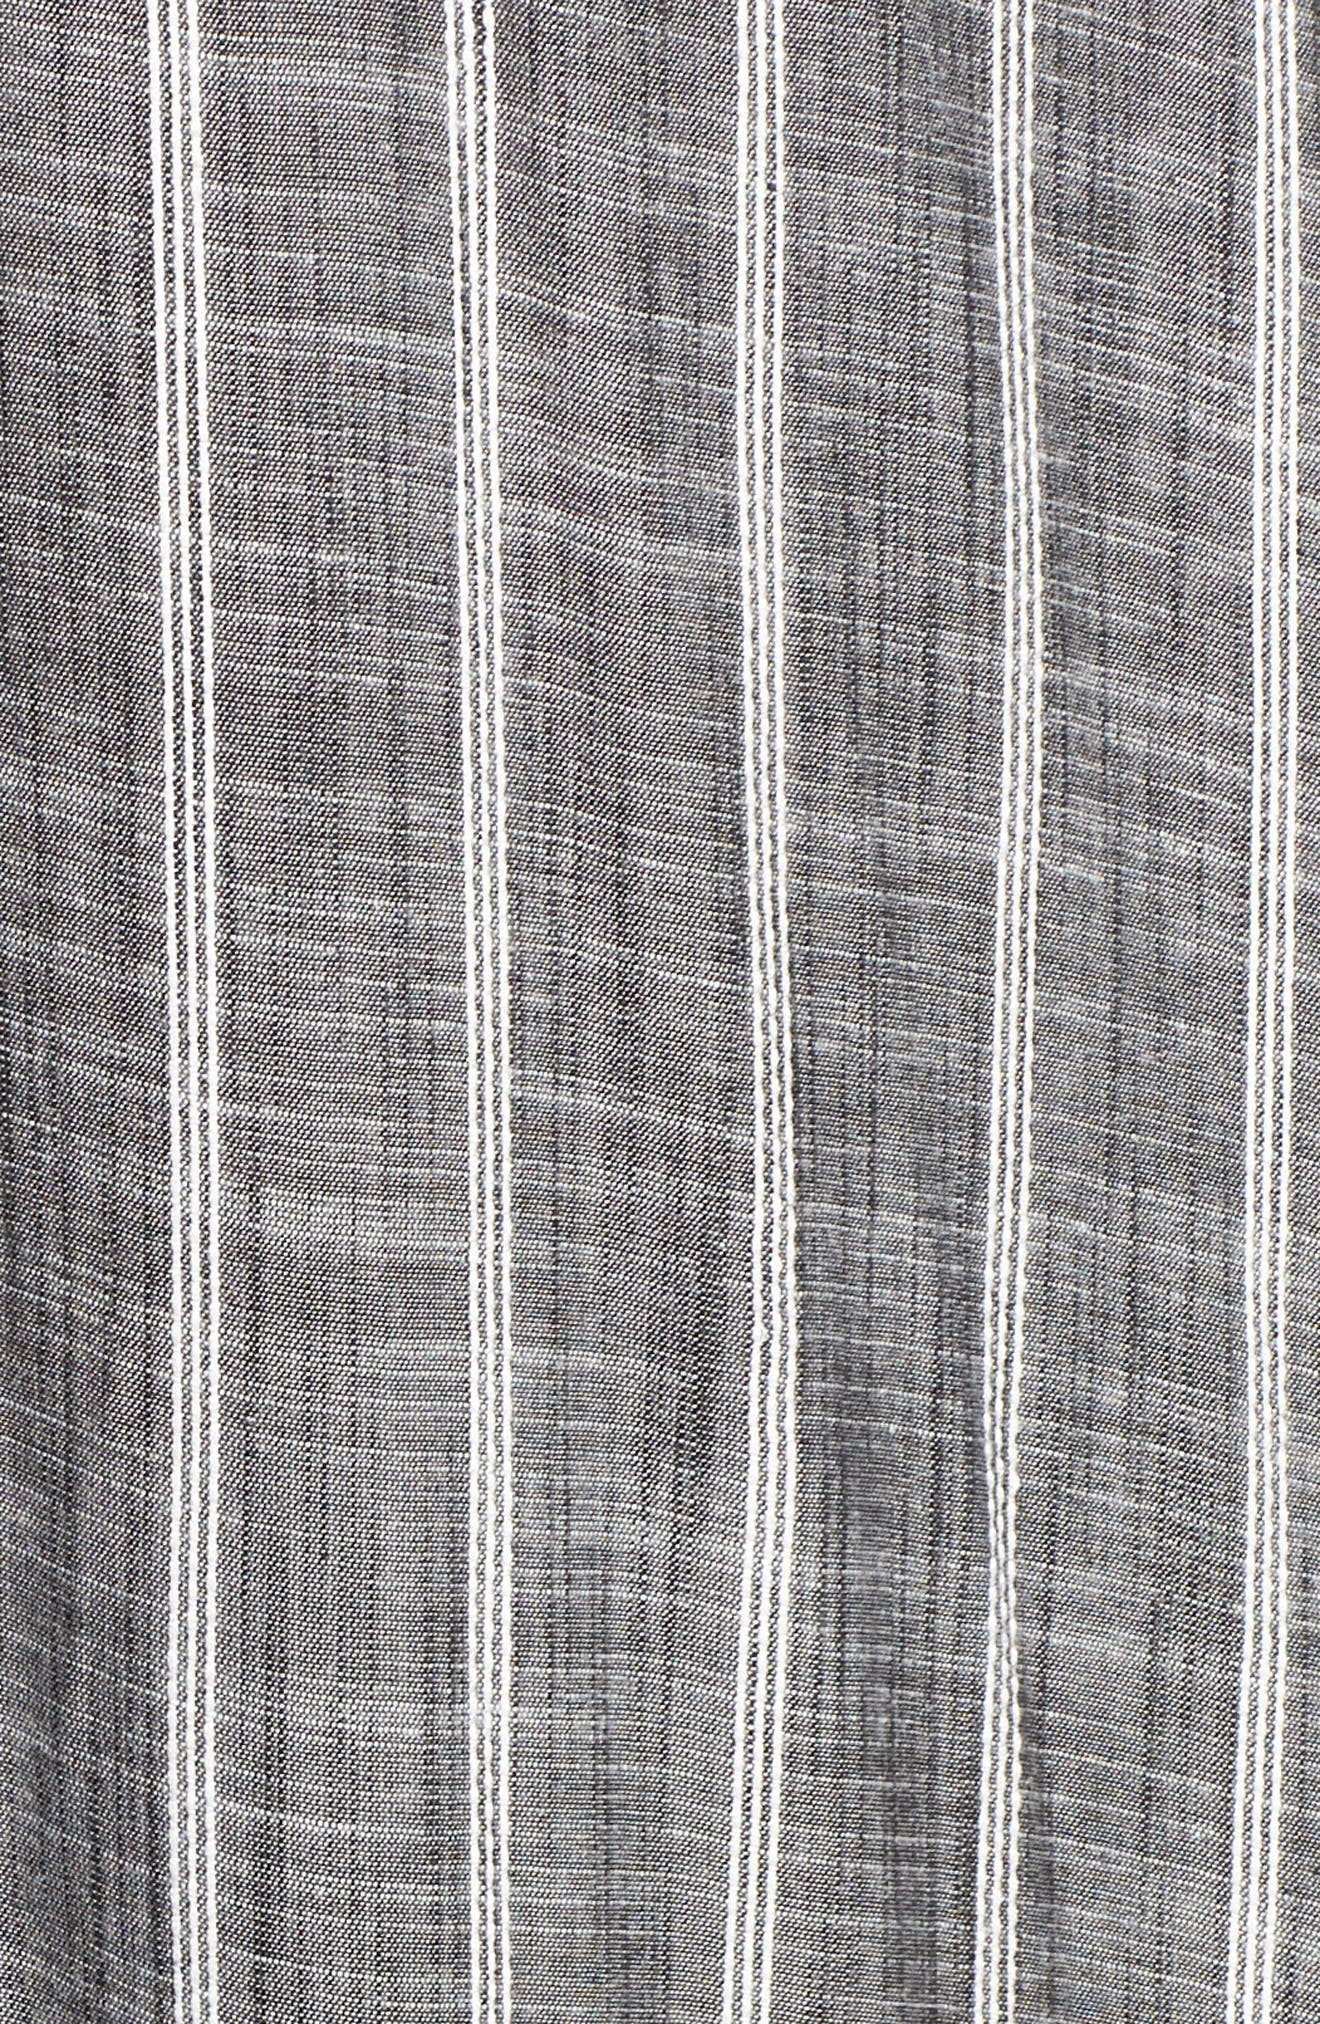 Cover-Up Maxi Dress,                             Alternate thumbnail 5, color,                             Grey